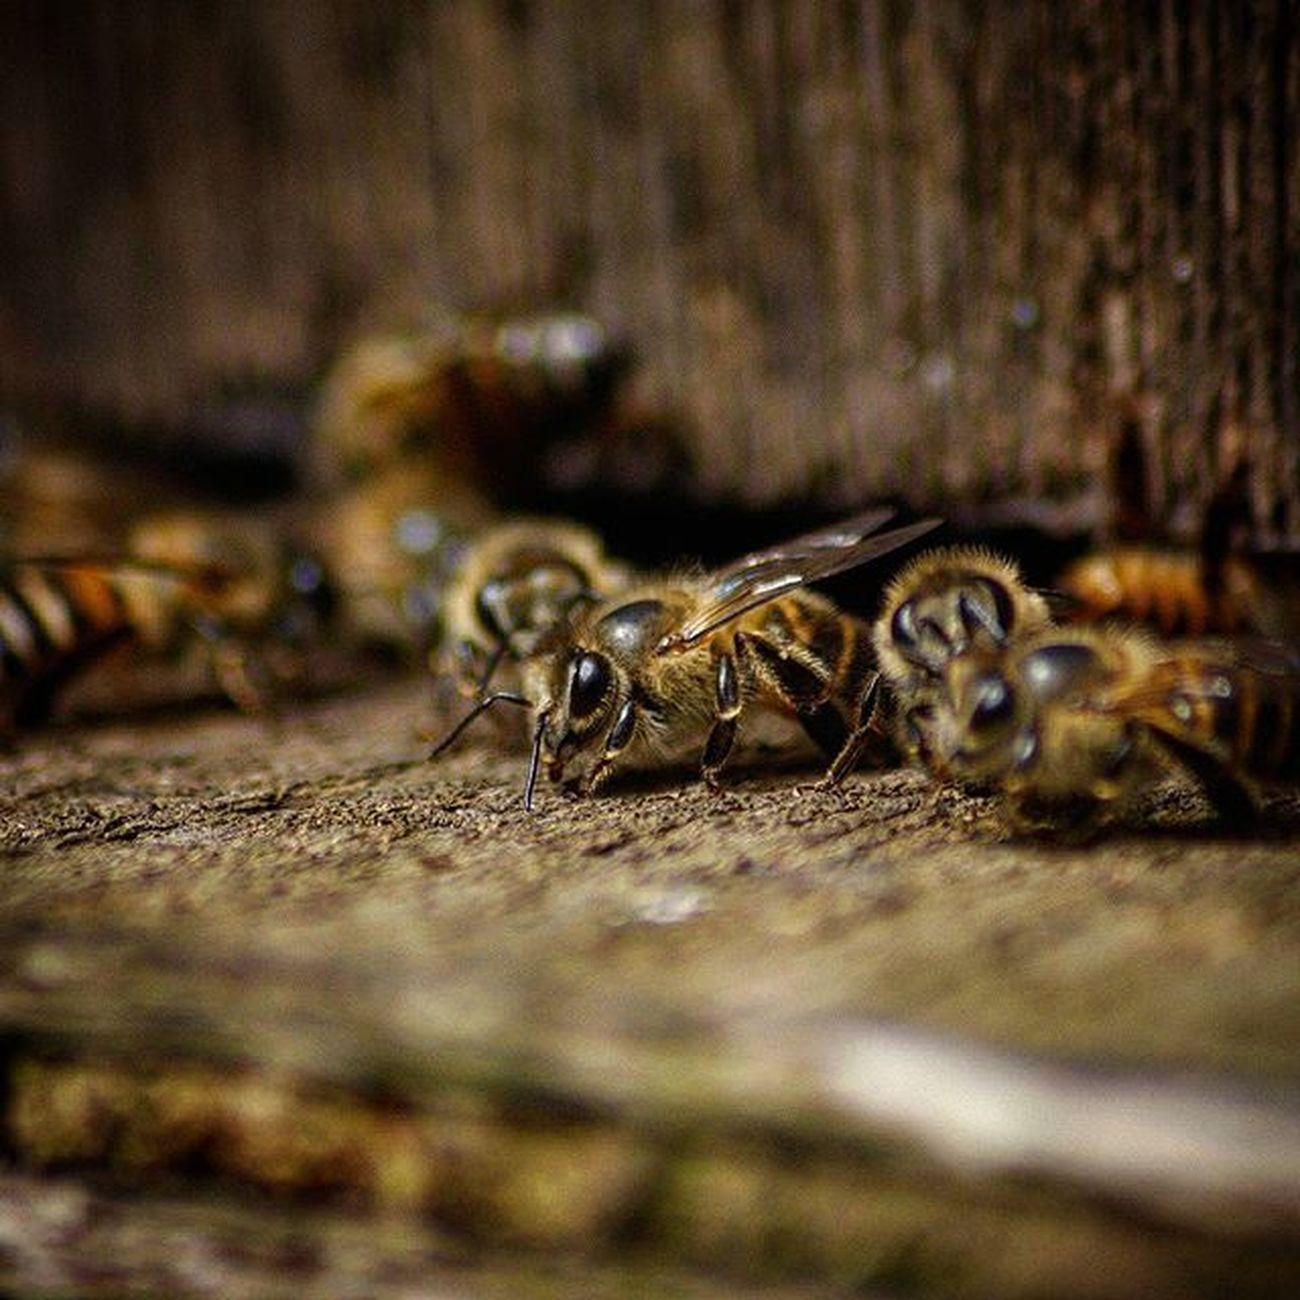 Honey and the bee 🐝🐝 Canoneos Canon40d TeamCanon Teamdslr Malaysia Kelantan Sigma70300mm Wildlifephotography Microlens  Canonawesome Beefarm Cameronhighland Pahang